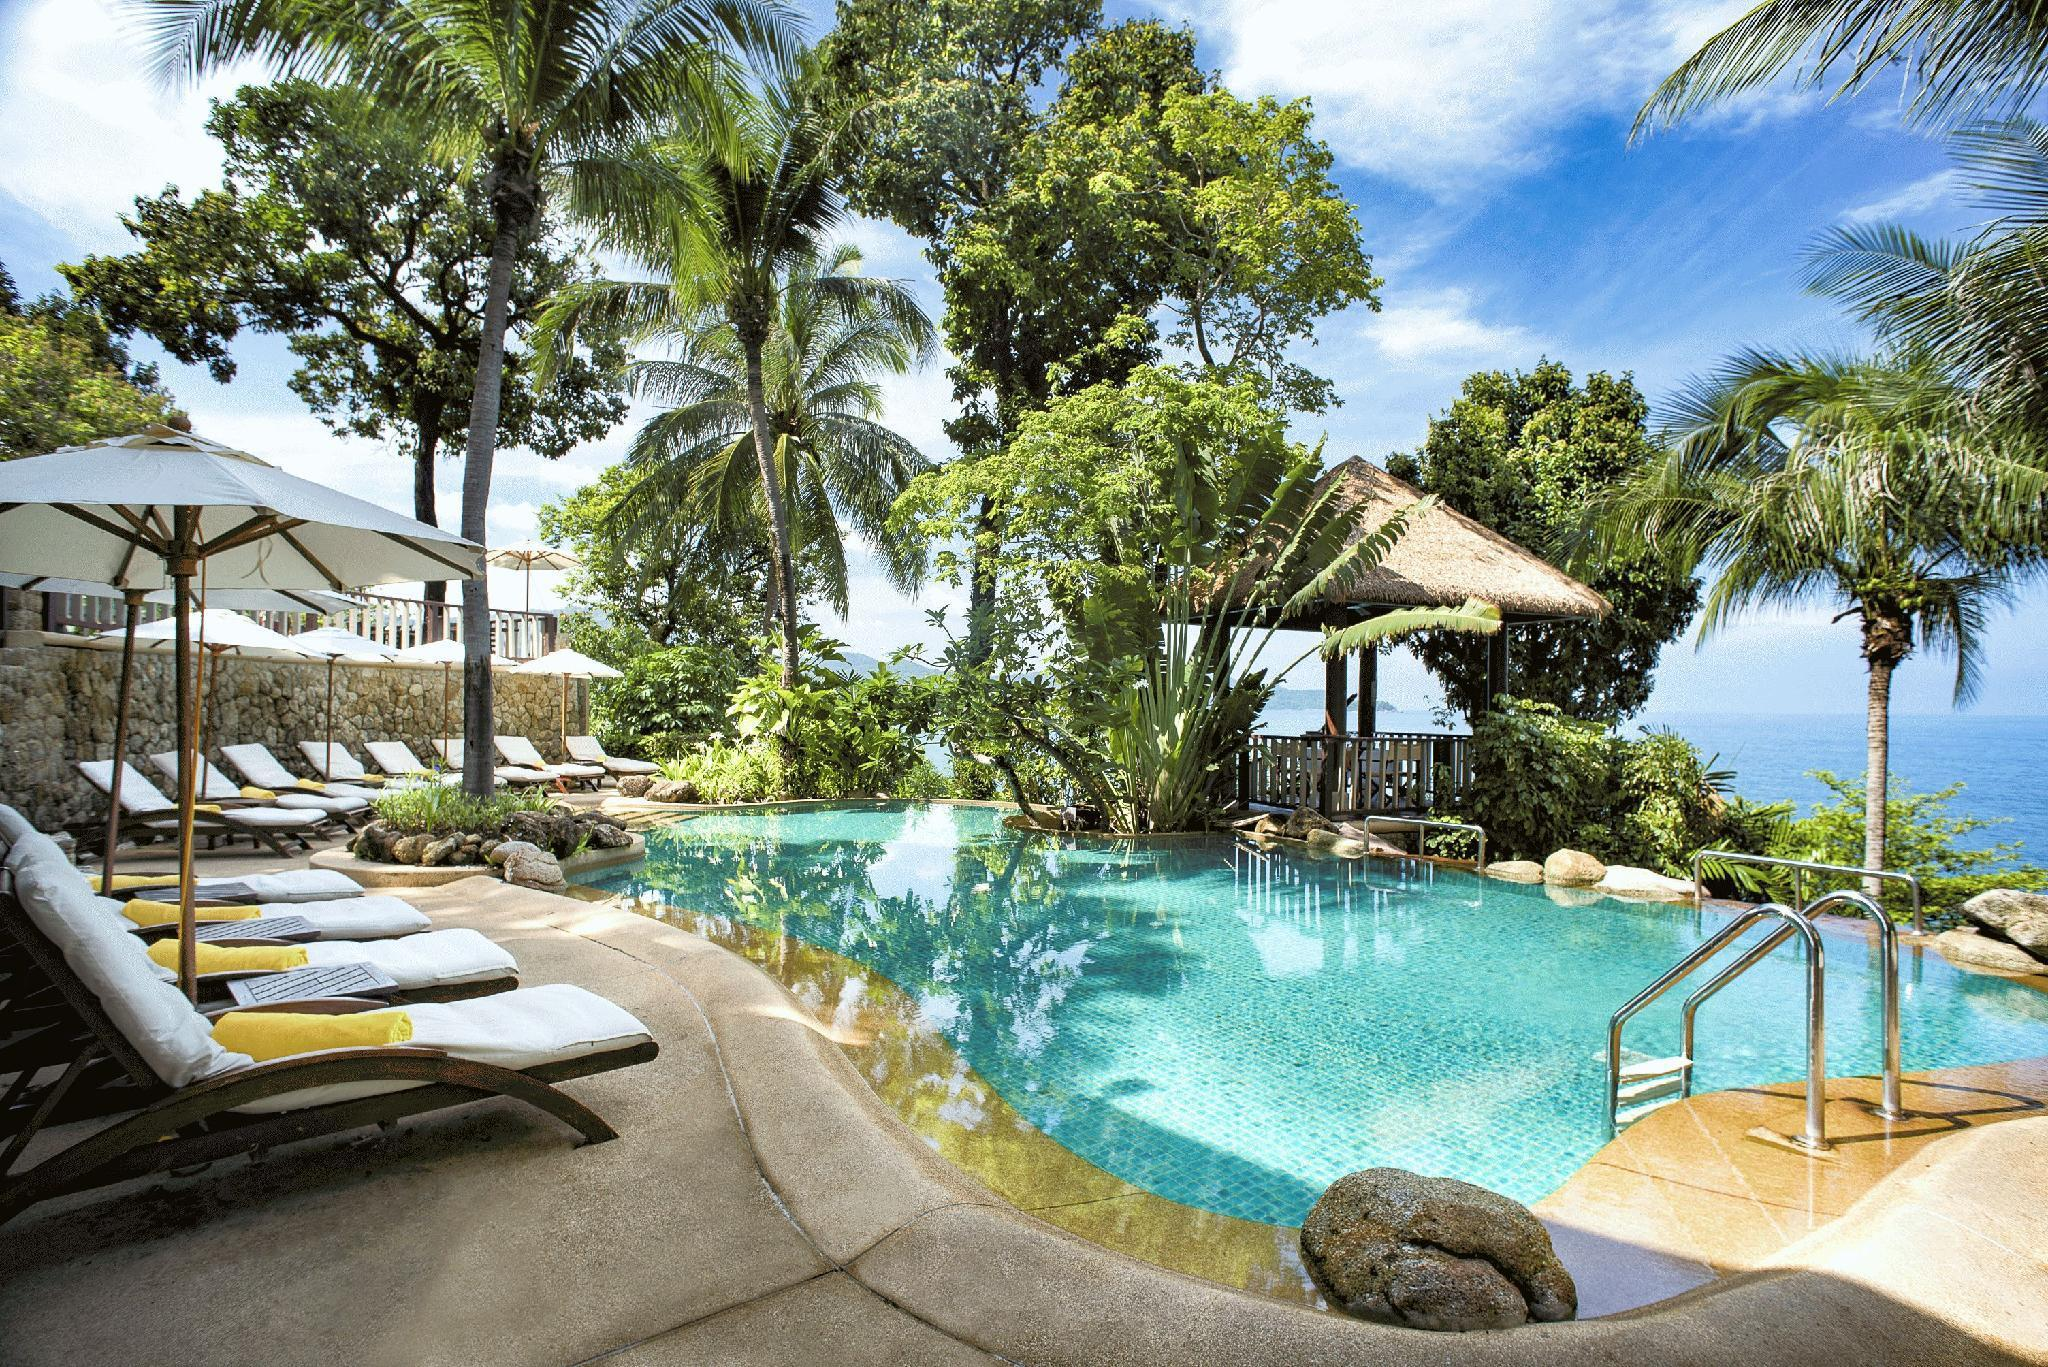 1 bed Deluxe villa in Karon วิลลา 1 ห้องนอน 1 ห้องน้ำส่วนตัว ขนาด 100 ตร.ม. – กะรน